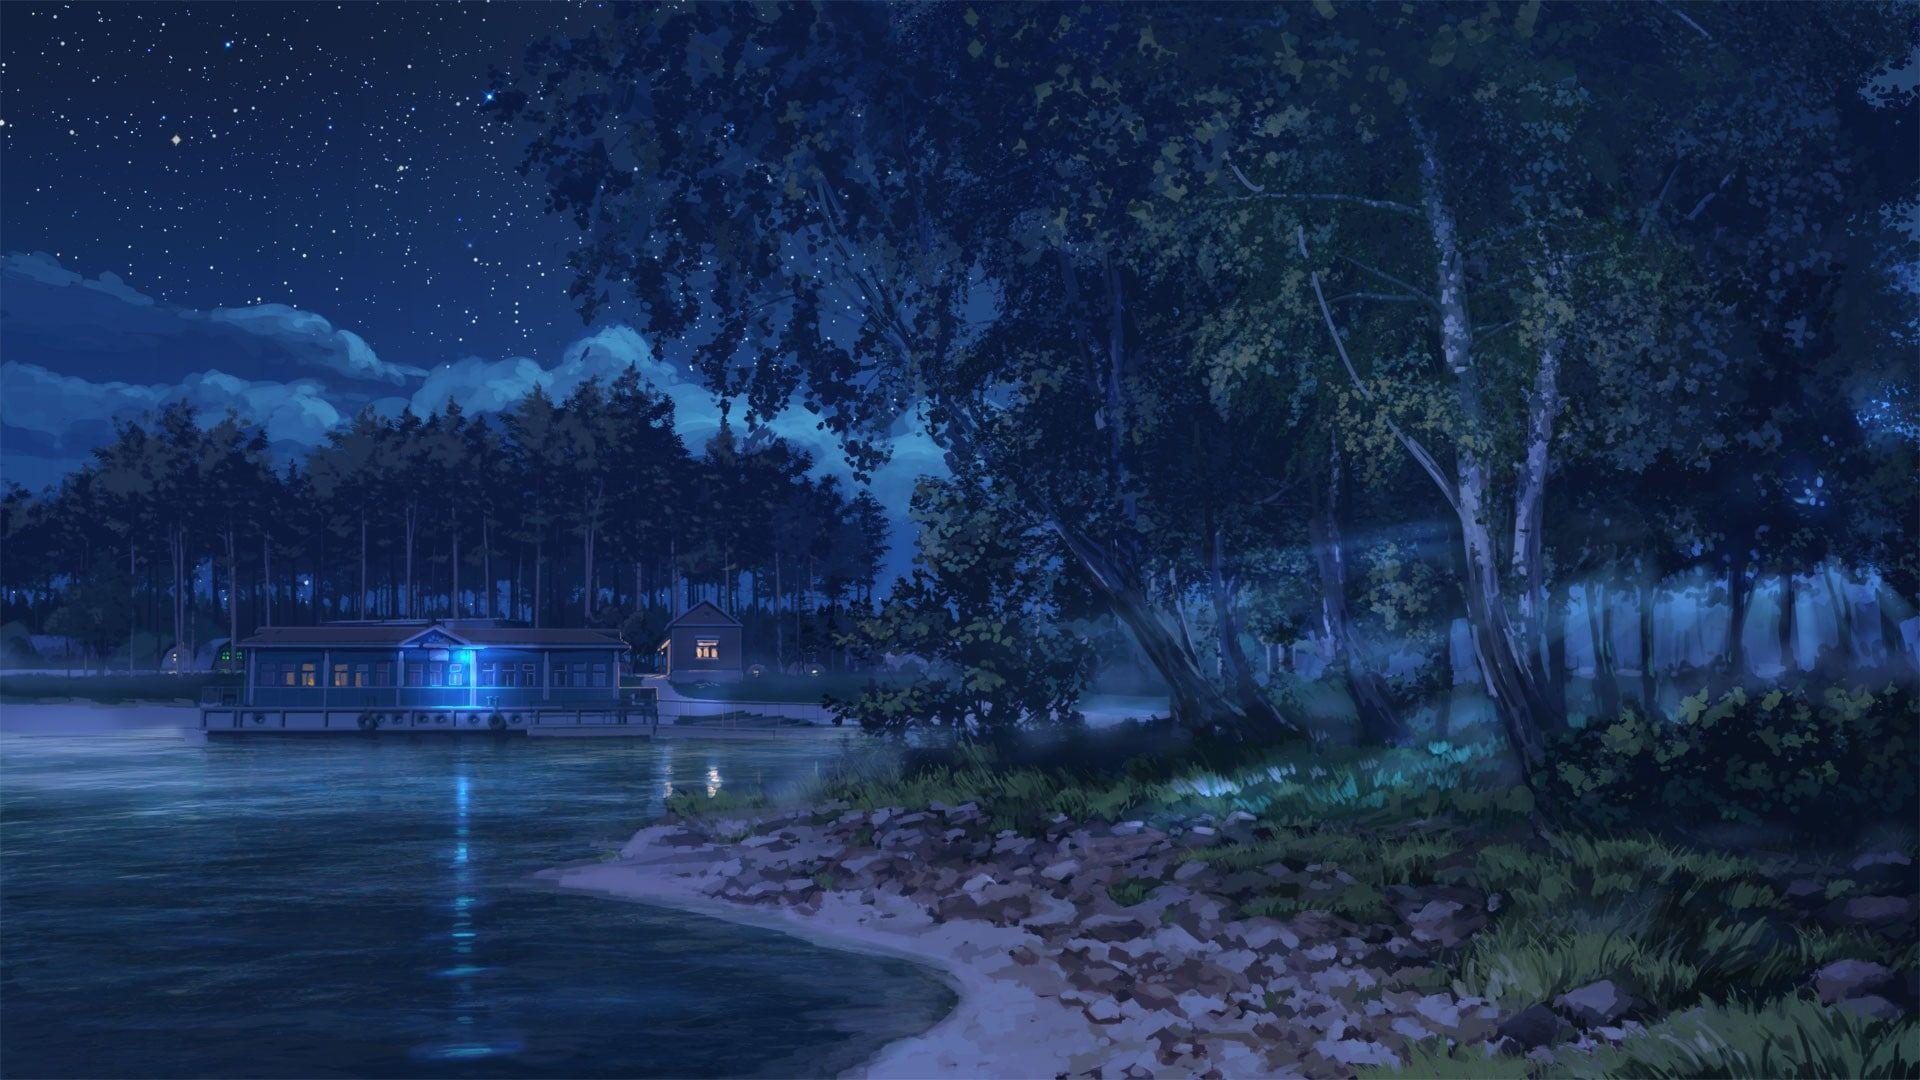 Everlasting Summer Starry Night Arsenixc 1080p Wallpaper Hdwallpaper Desktop Cenario Anime Ilustracao De Paisagem Paisagem Fantasia